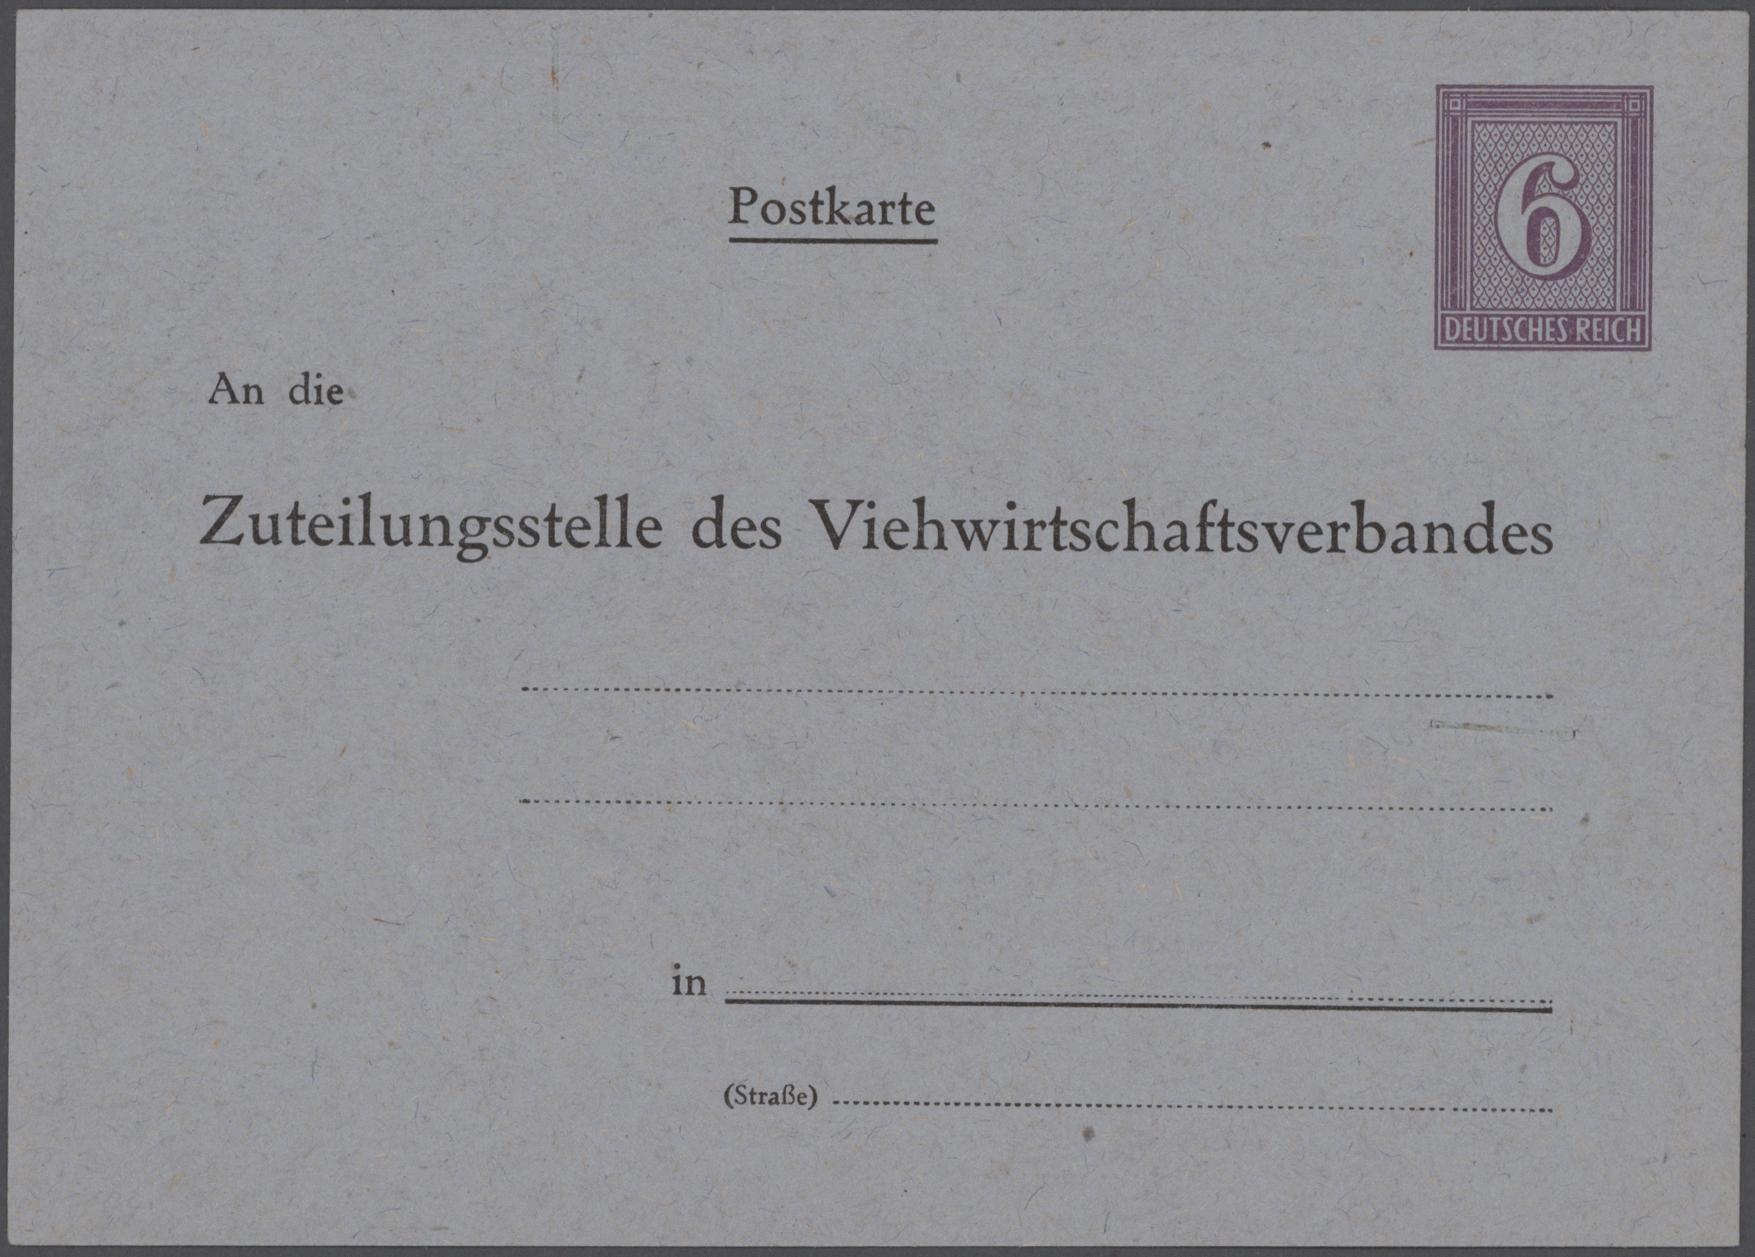 Lot 23545 - Deutsches Reich - Privatganzsachen  -  Auktionshaus Christoph Gärtner GmbH & Co. KG Sale #49 Collections Overseas, Thematics, Europe, Germany/Estates